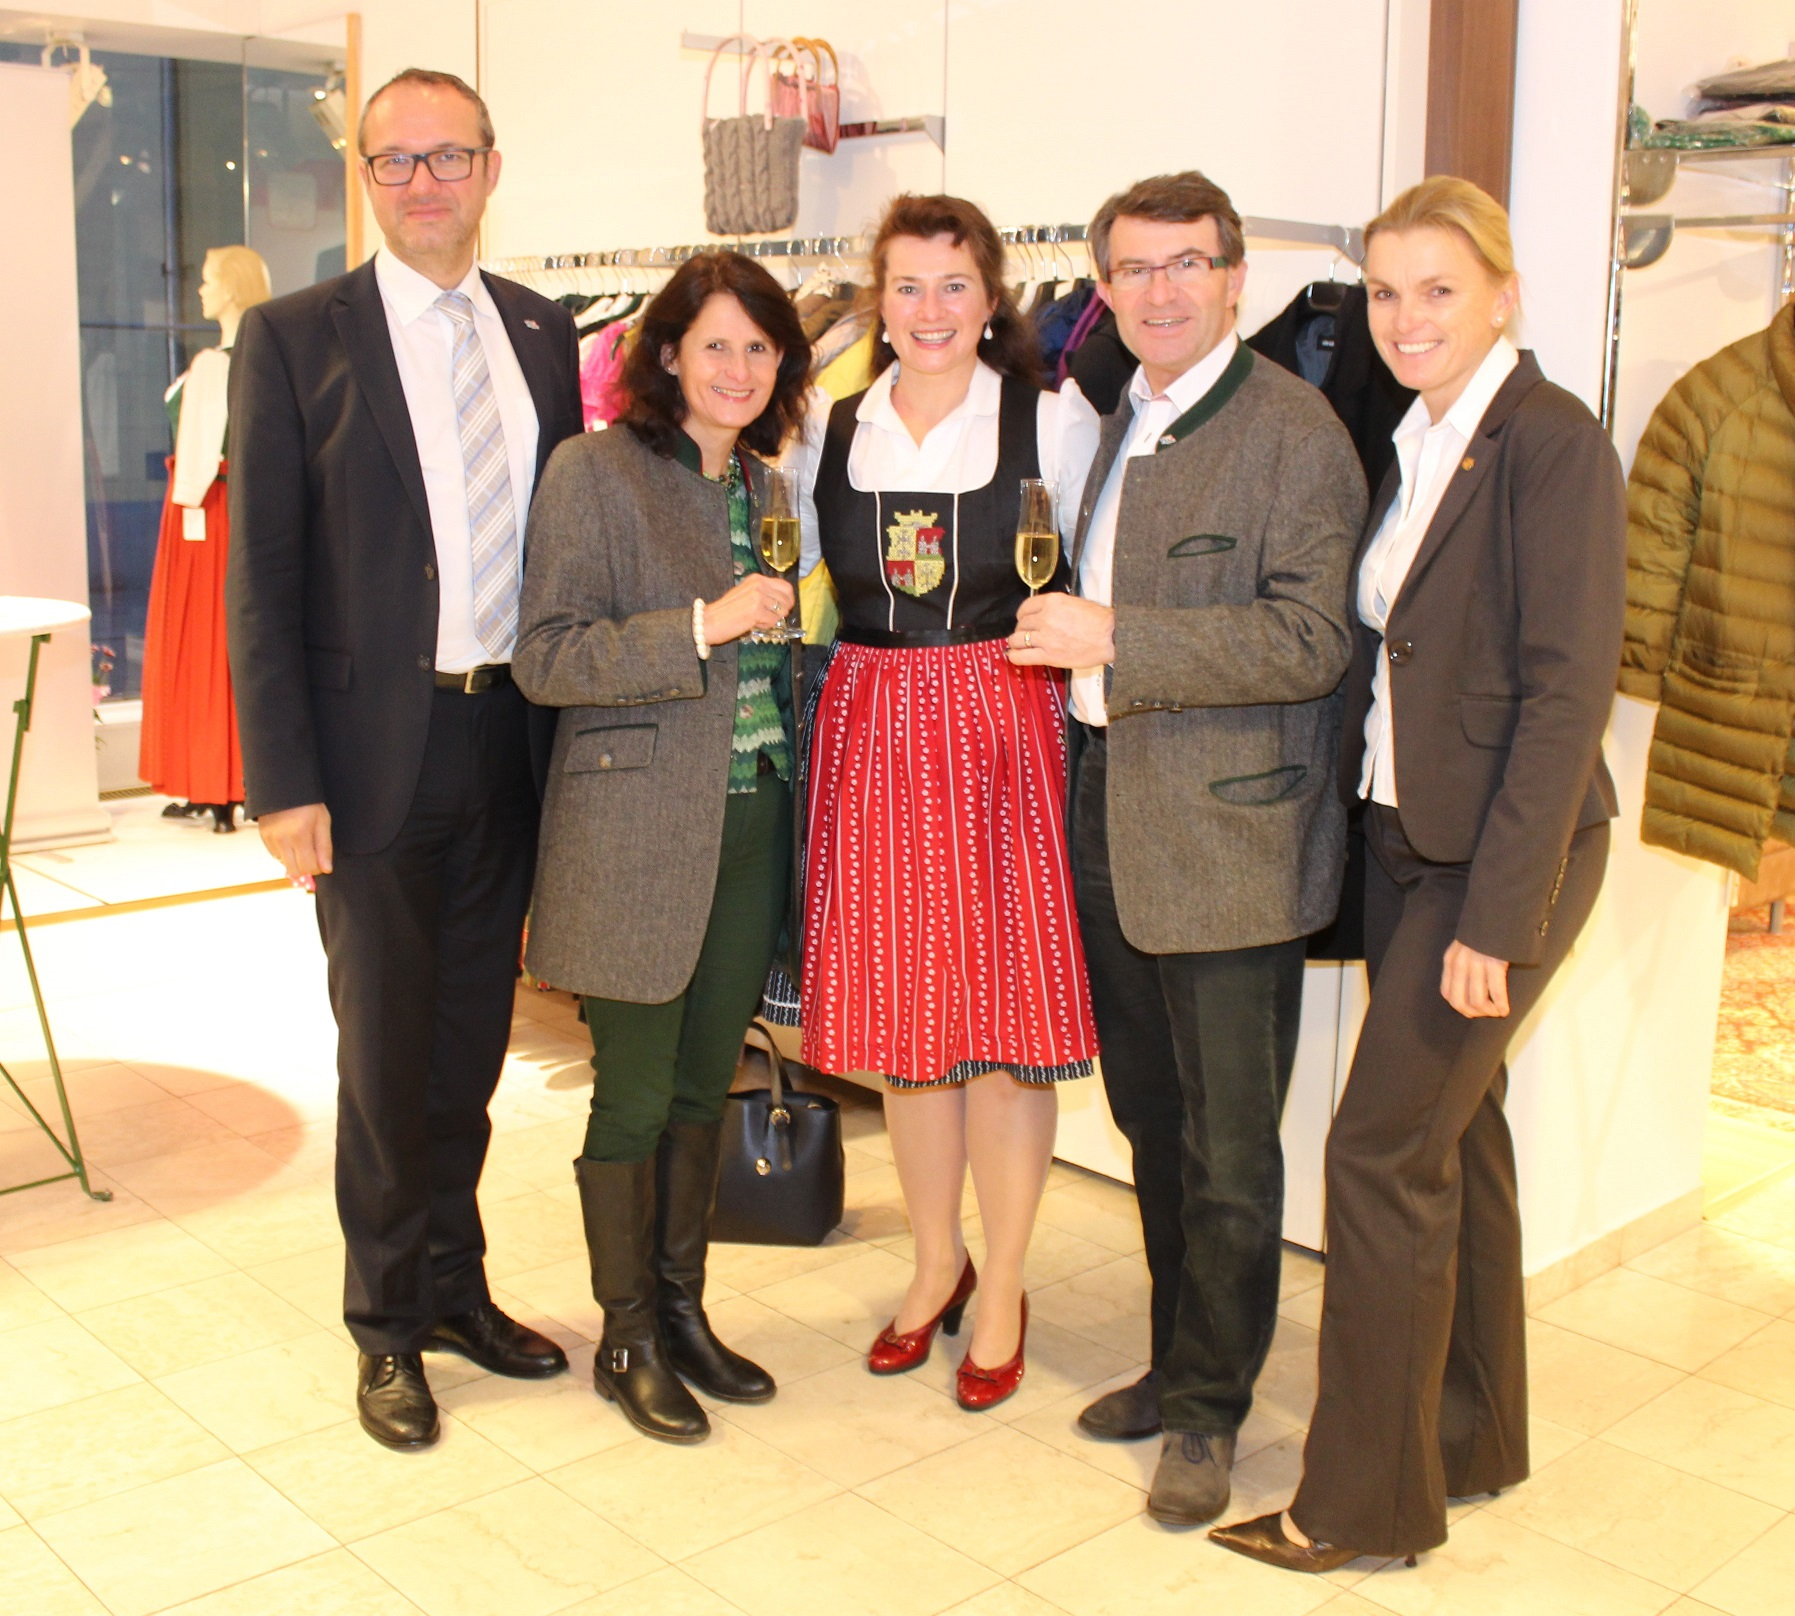 Eröffnungsmodeschau - Dr. Klosterer, Rosi Piribauer, Elke Wainig, SR Franz Piribauer, SR Lidwina Unger